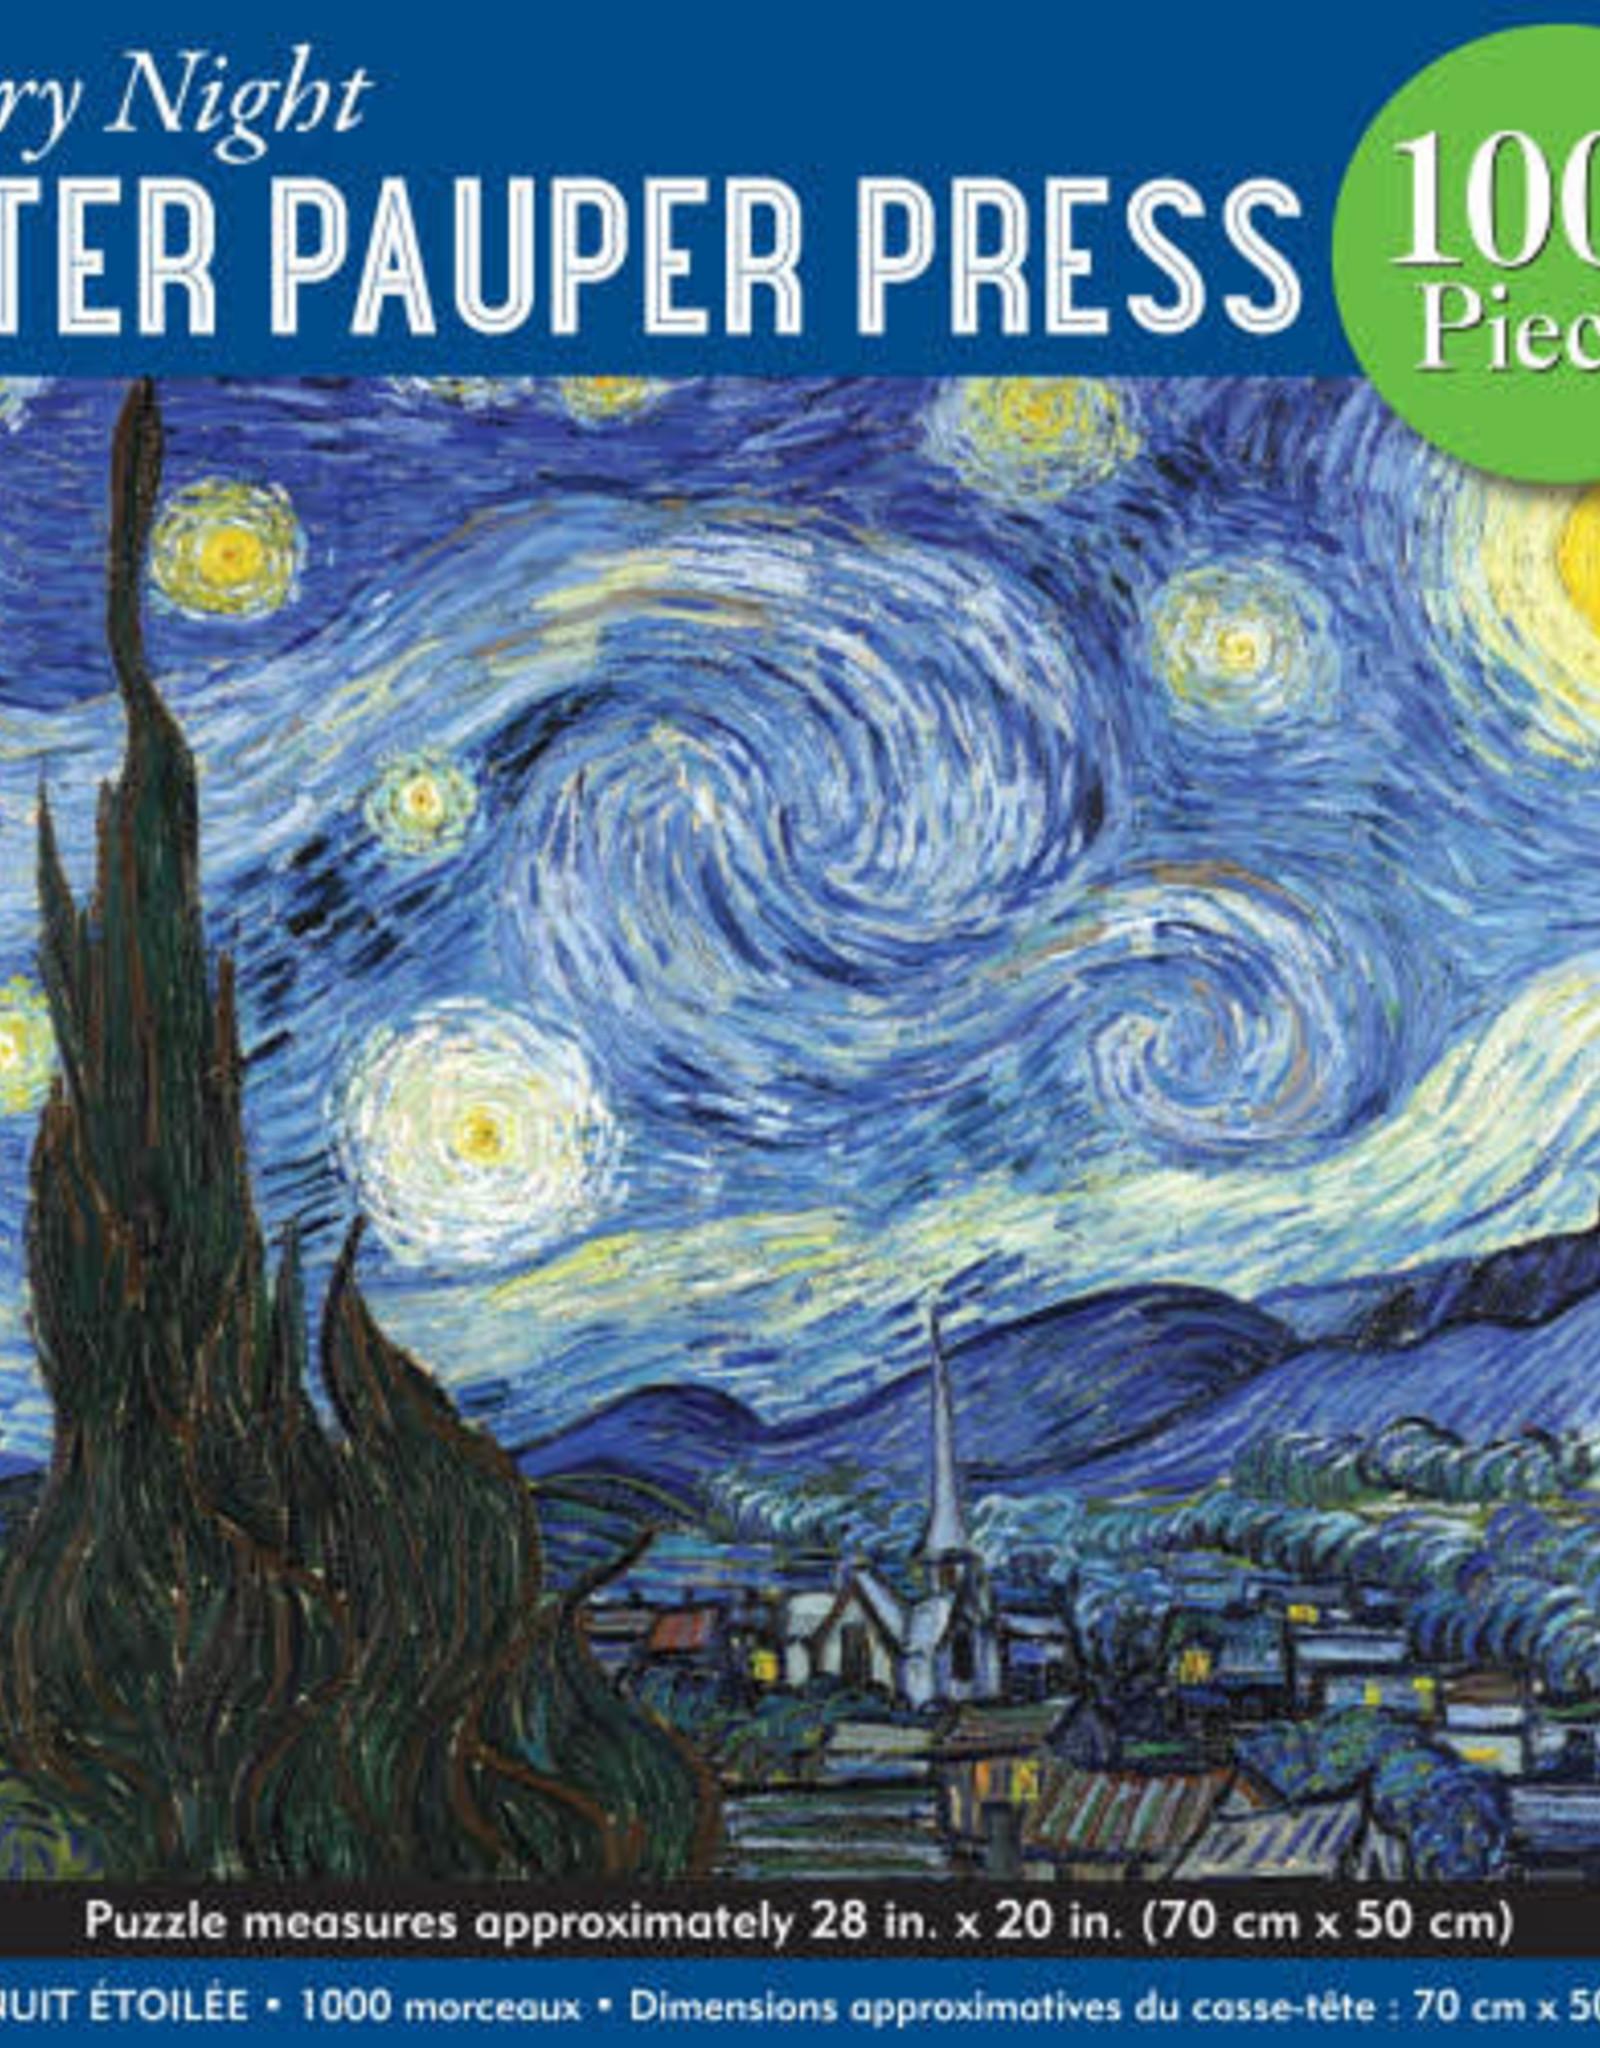 Starry Night Puzzle - 1000 Piece